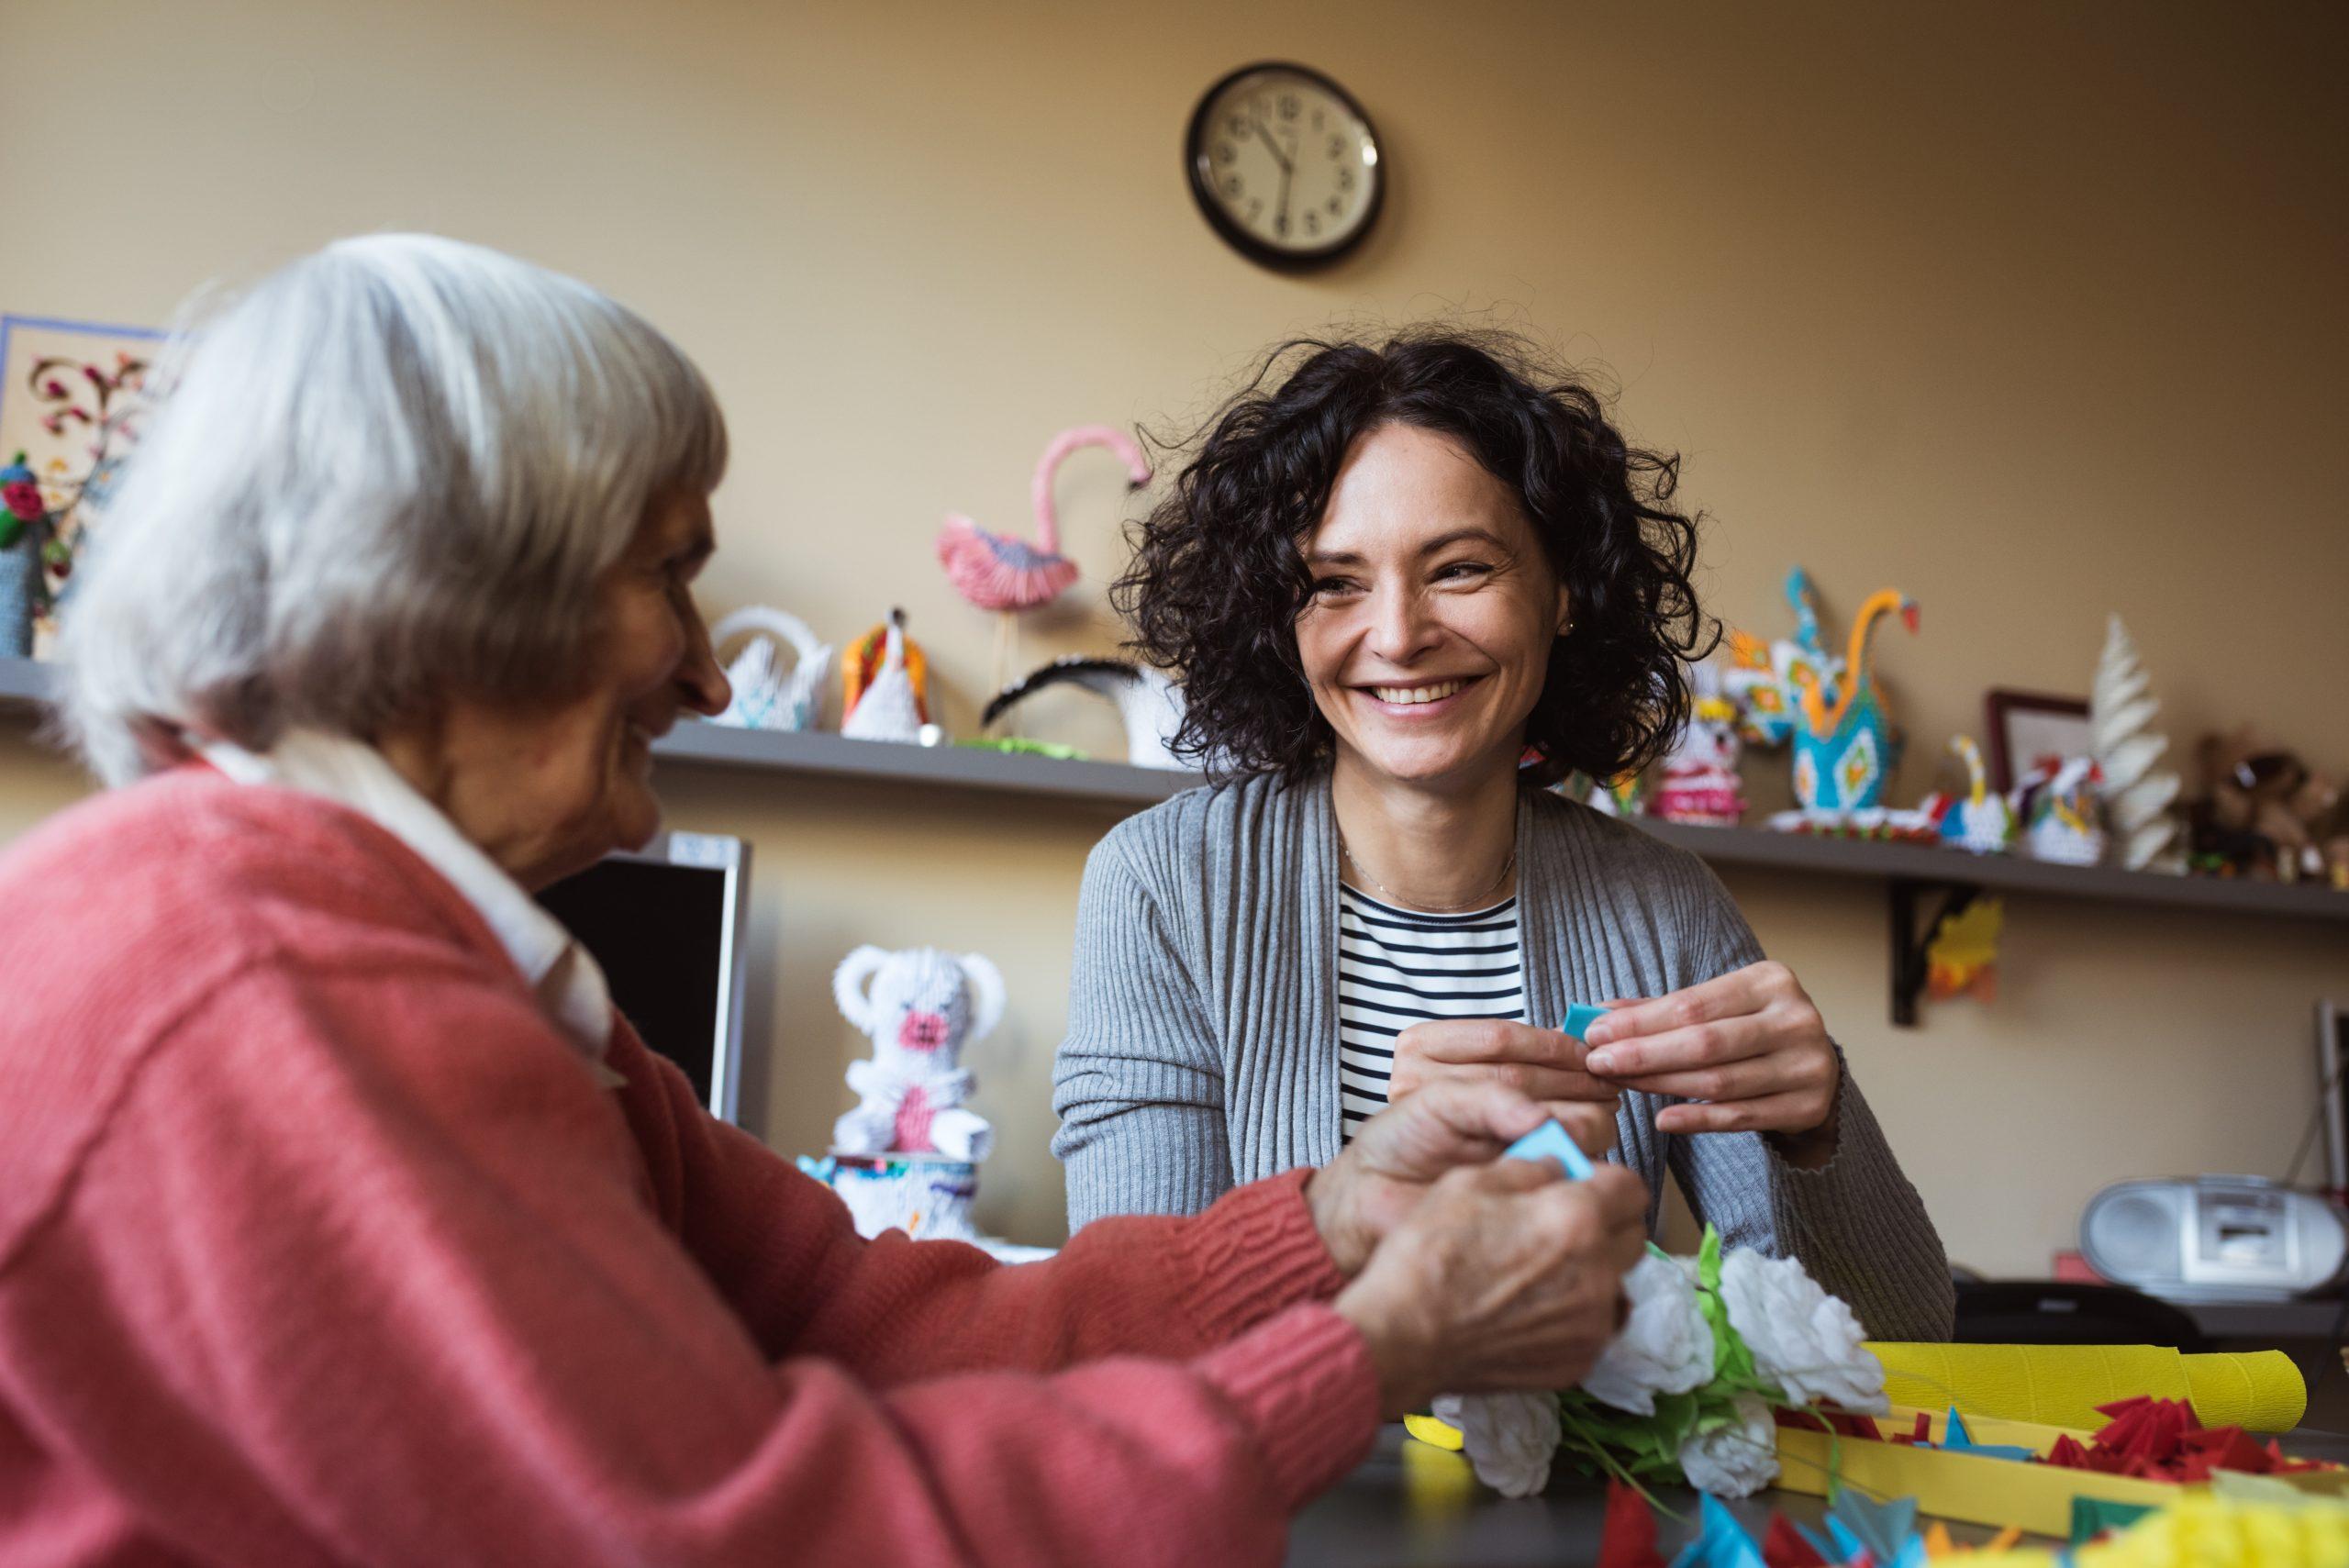 senior-care-plus-cargiver-enjoying-moment-with-aged-women